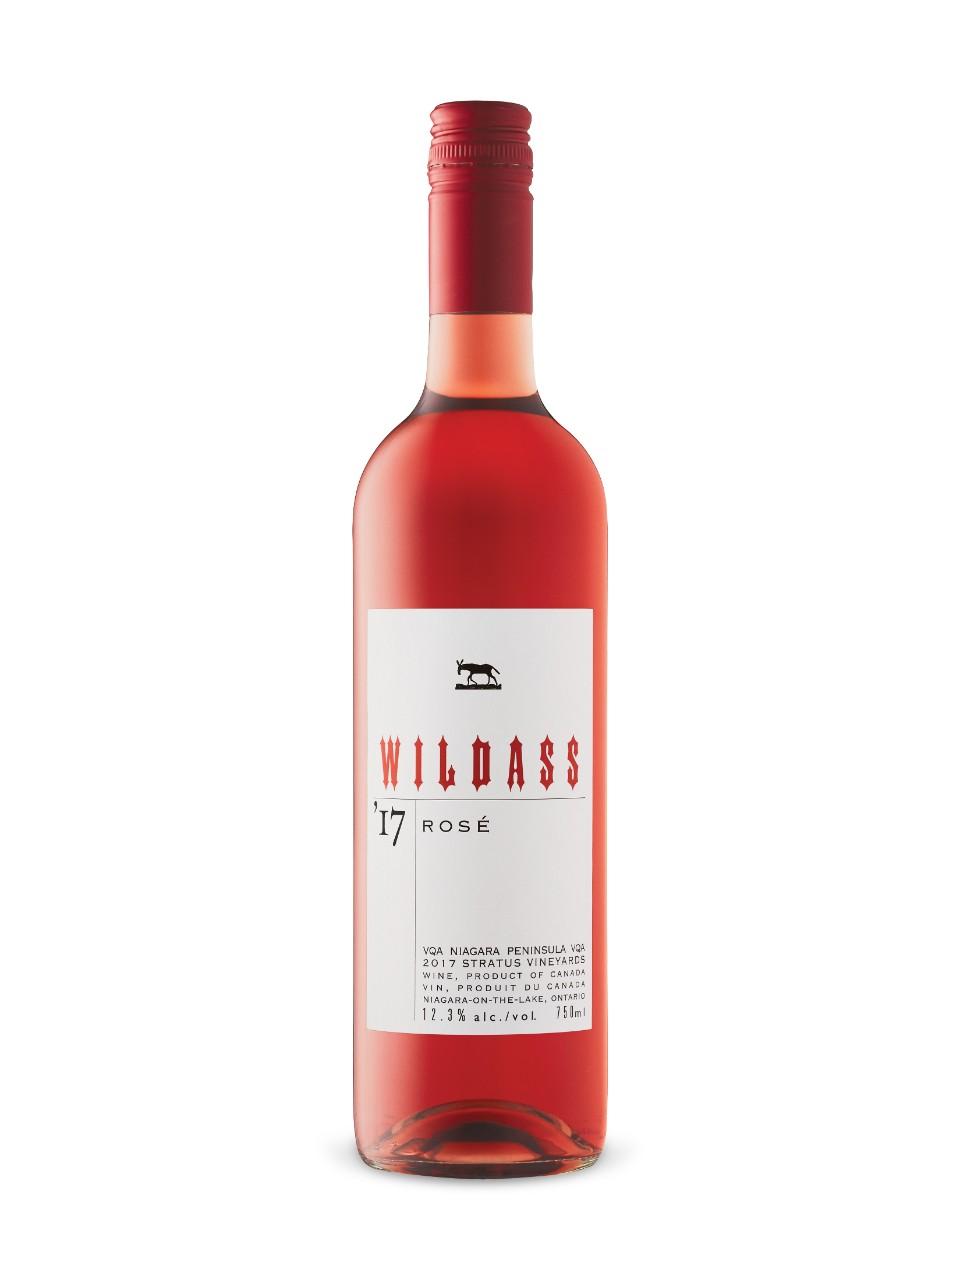 Wildass Rosé Stratus